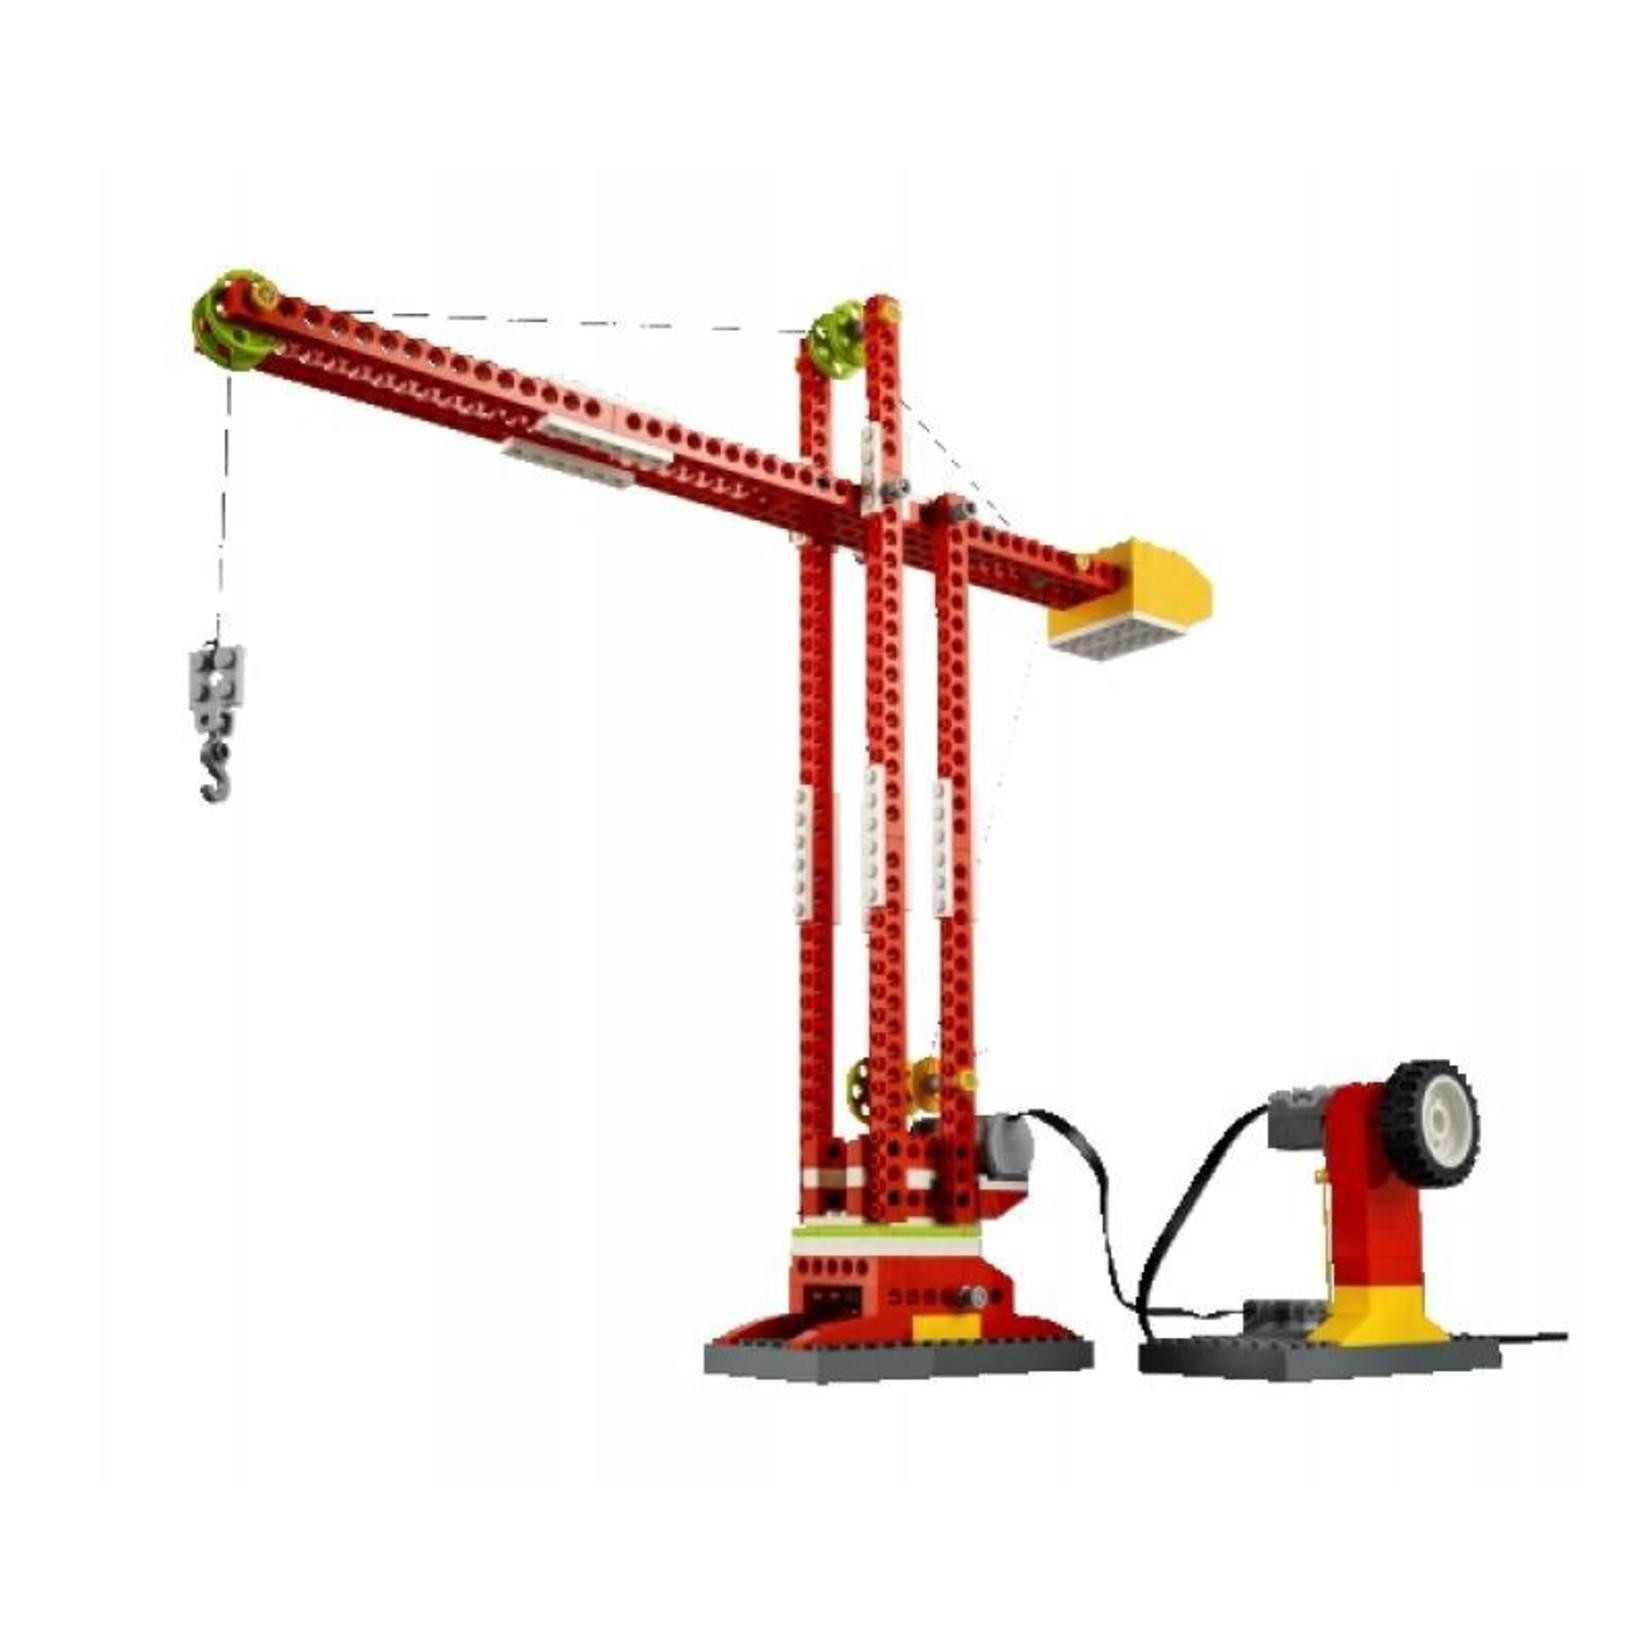 LEGO® Education WeDo uitbreidingsset